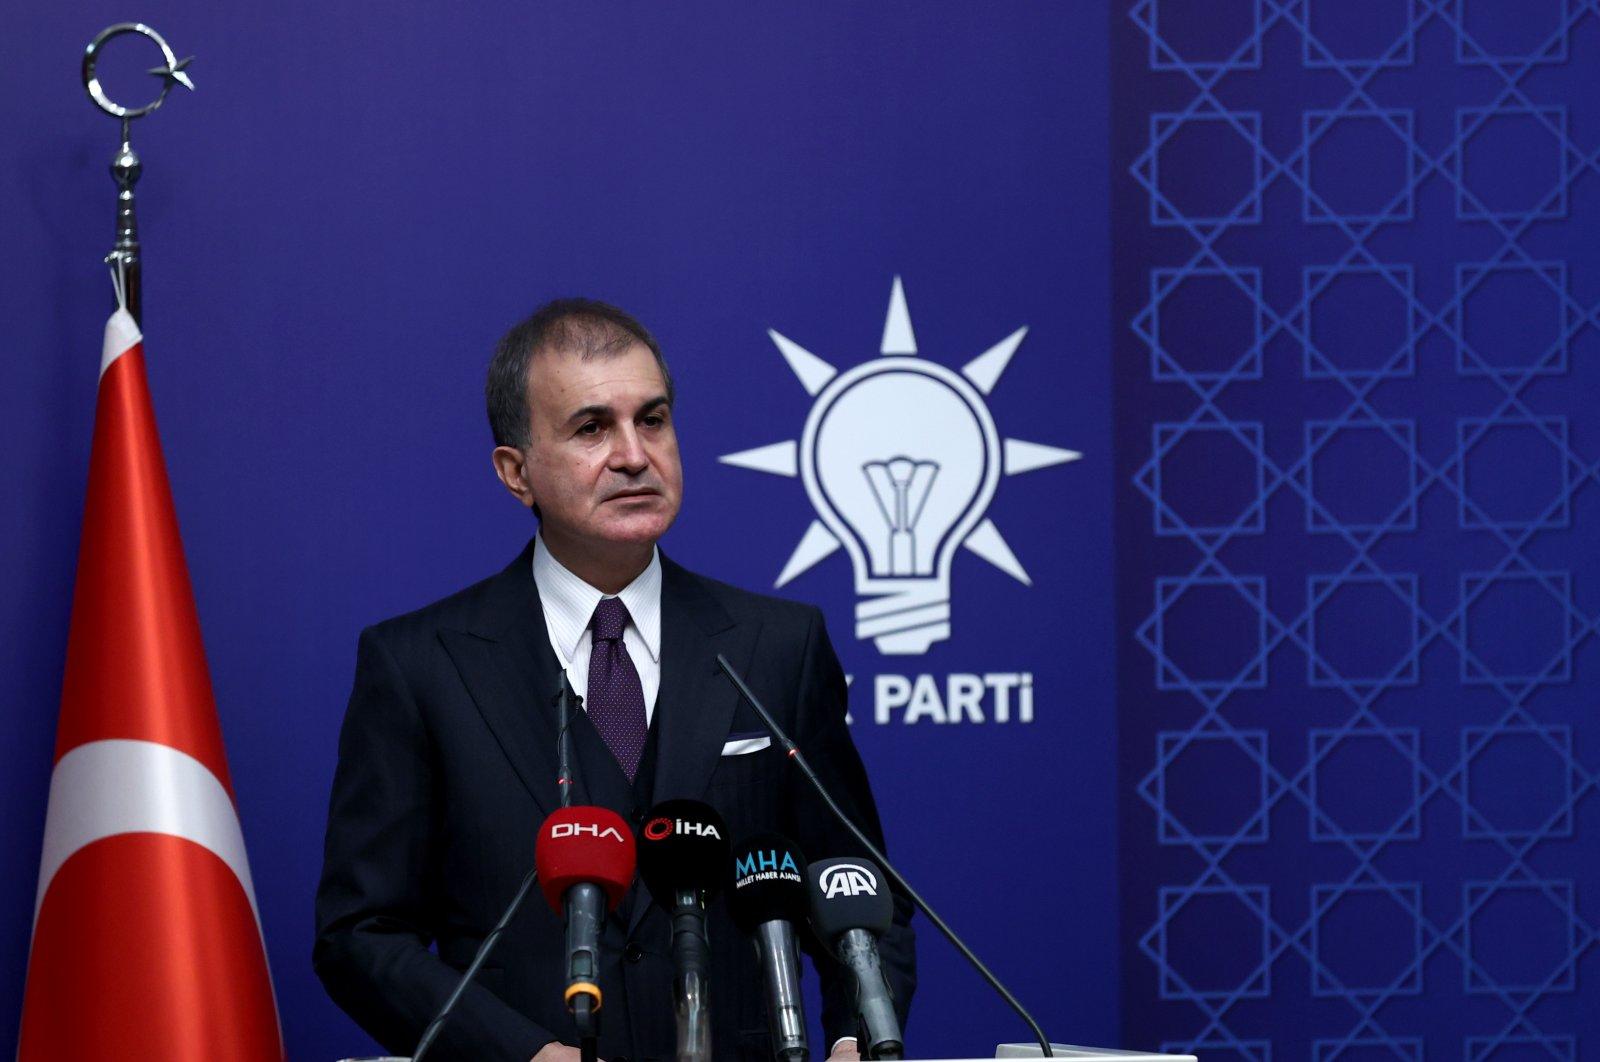 Justice and Development Party (AK Party) Spokesperson Ömer Çelik speaks during a press conference in Ankara, Turkey, April 5, 2021. (AA)